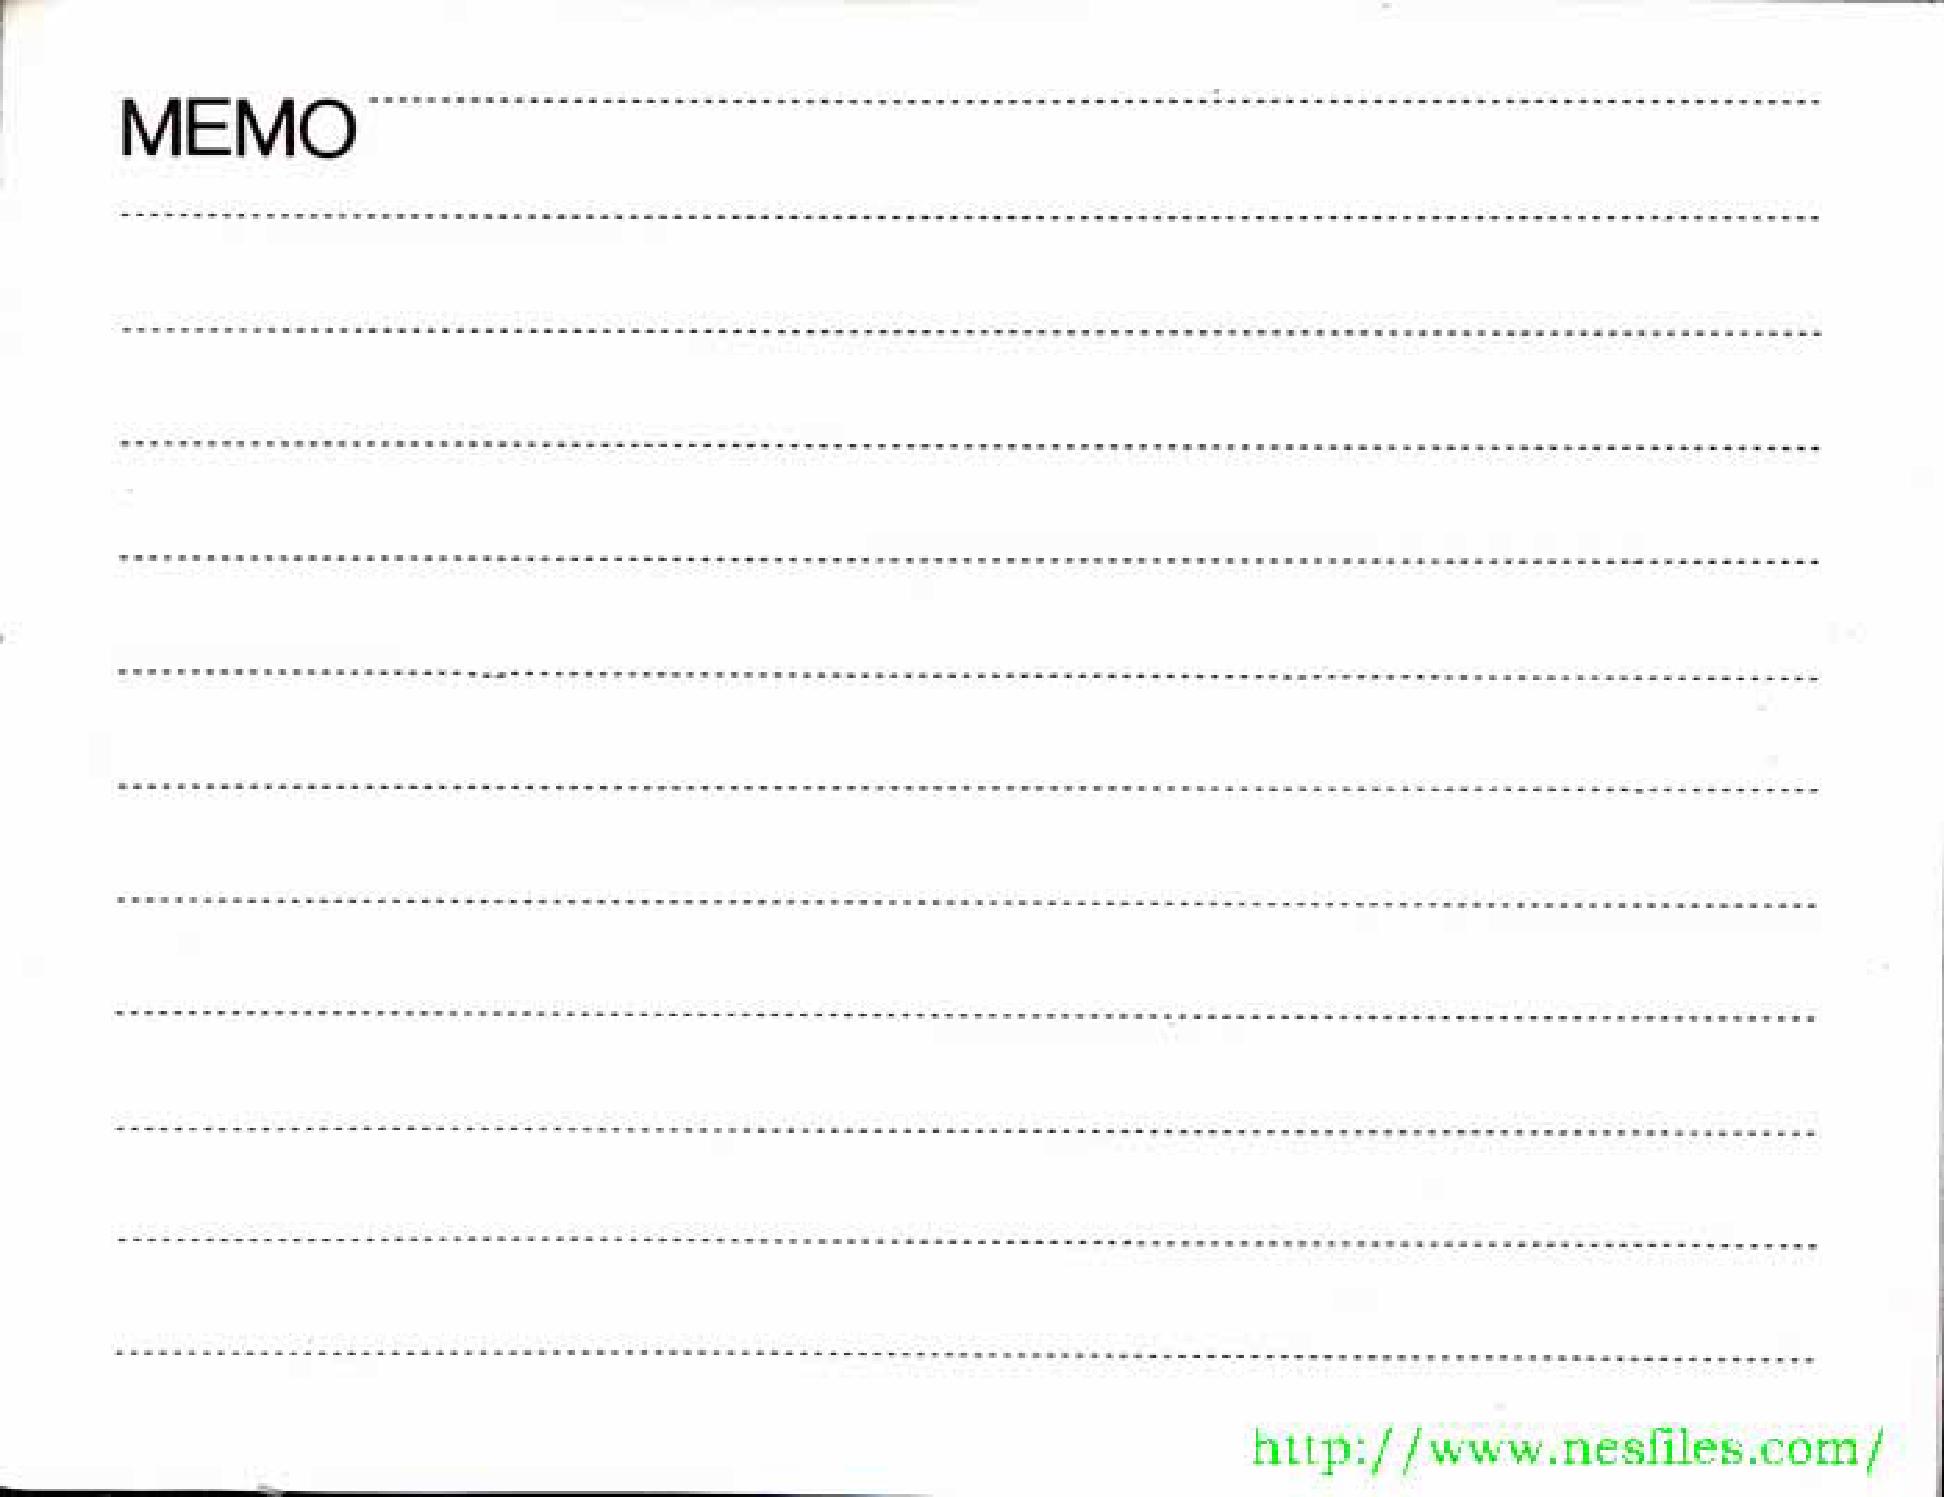 manual memo page